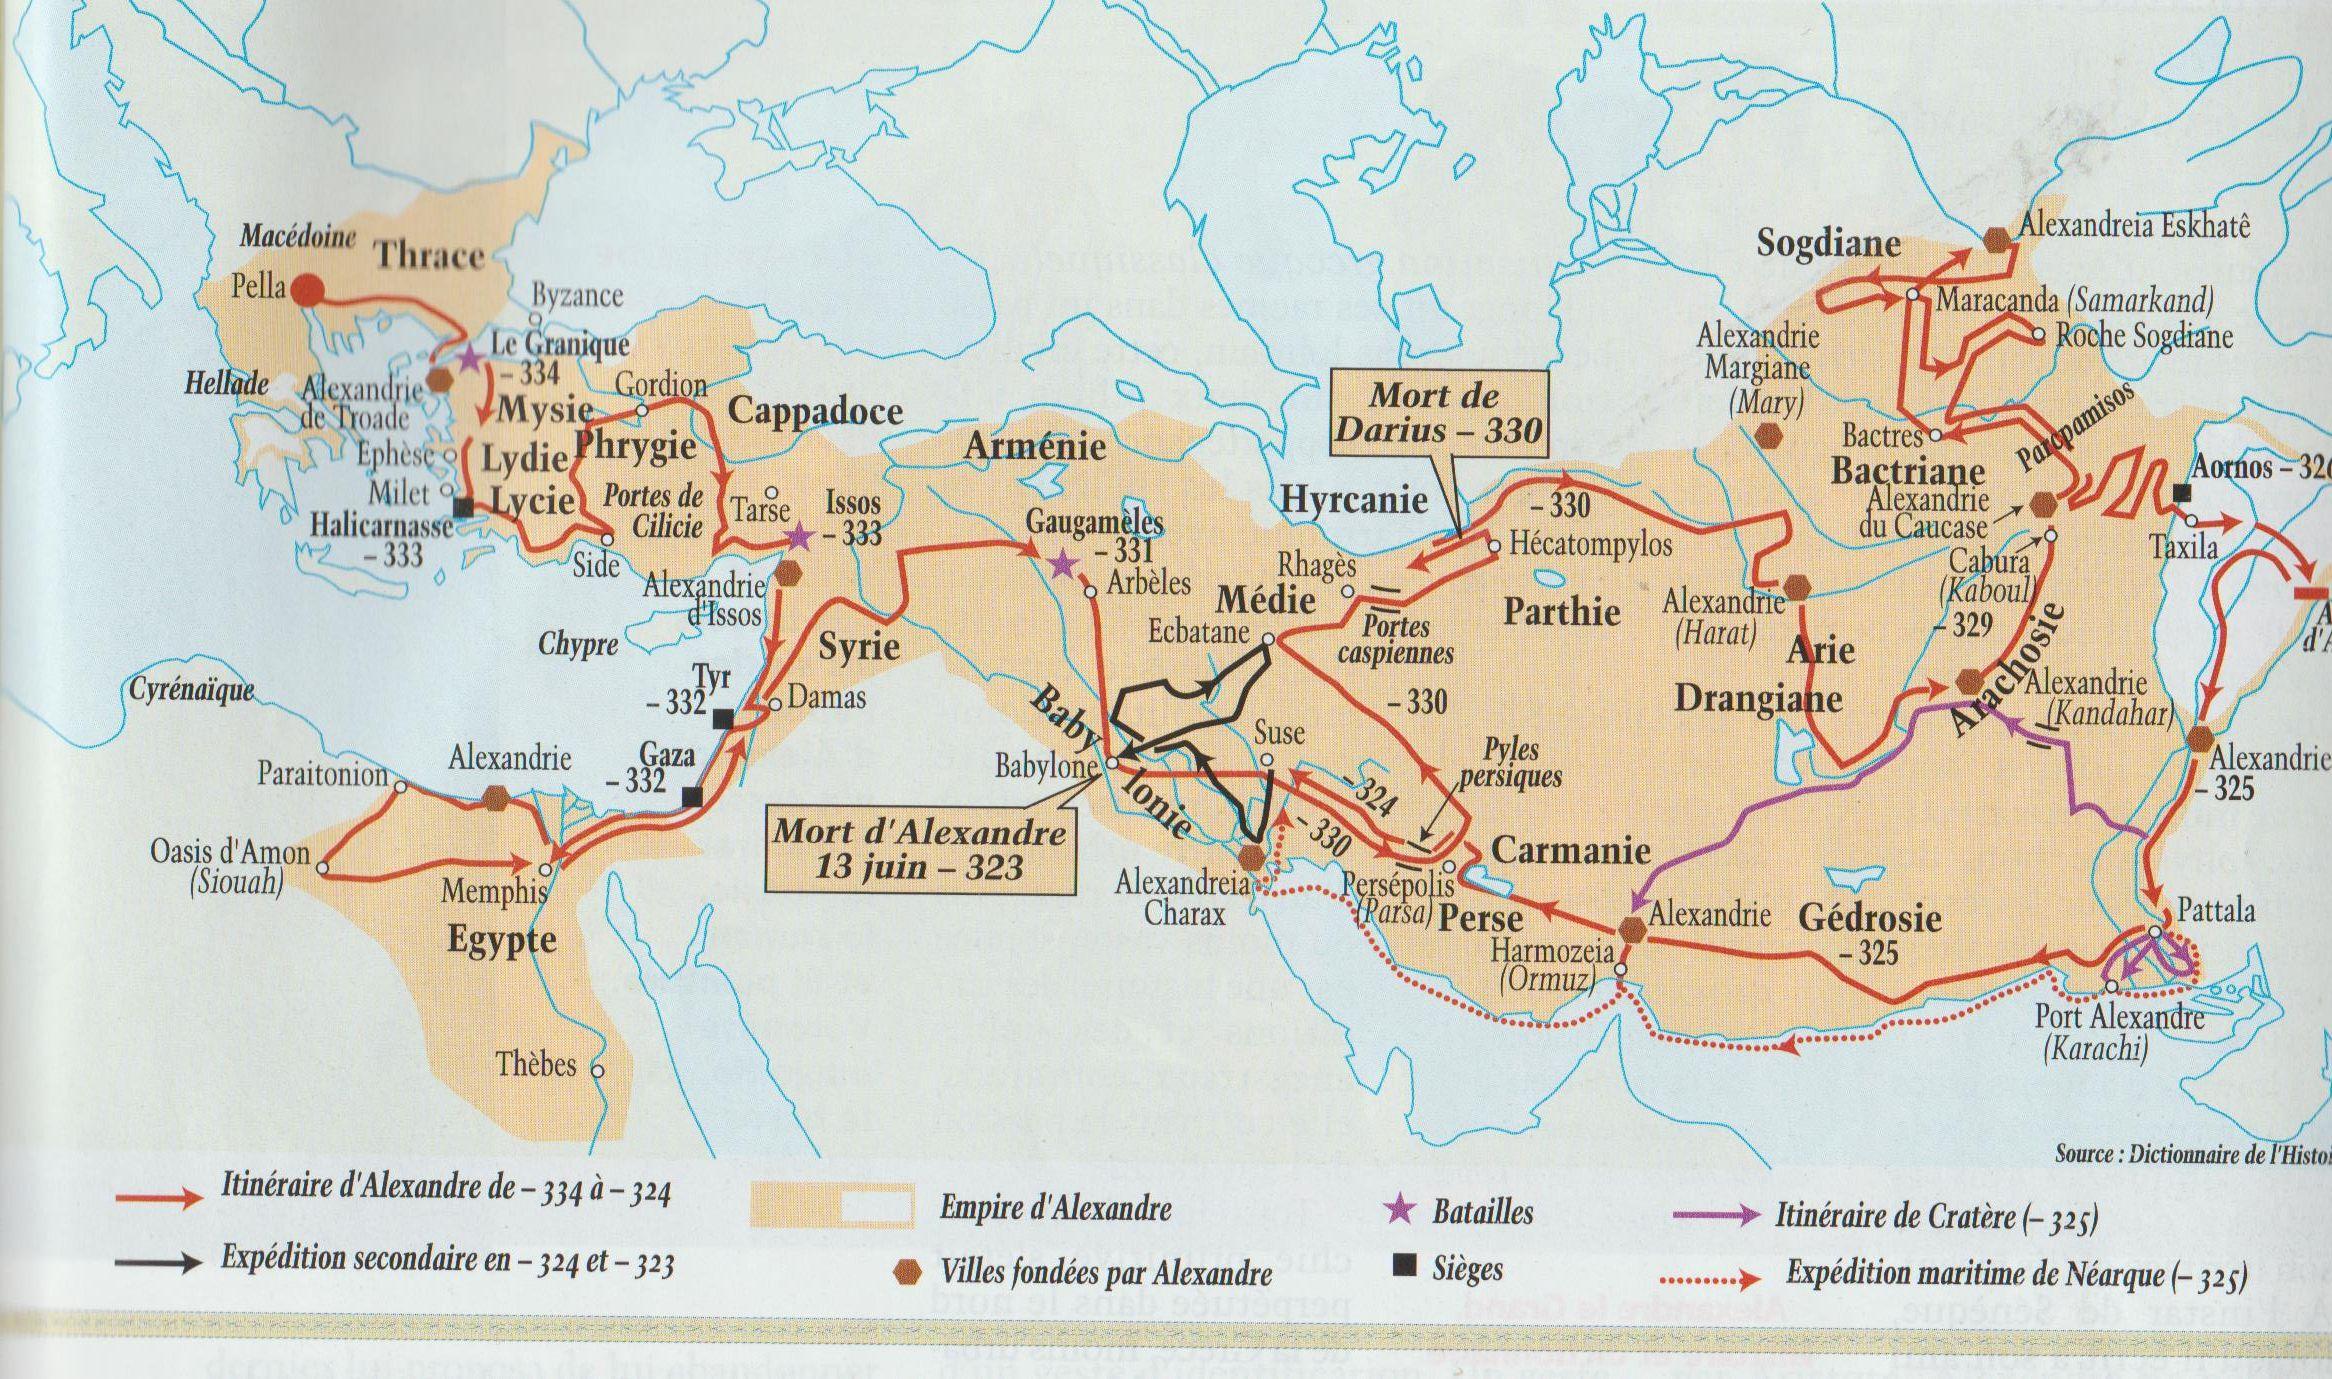 Empire d'Alexandre  villes fondées 001.jpg